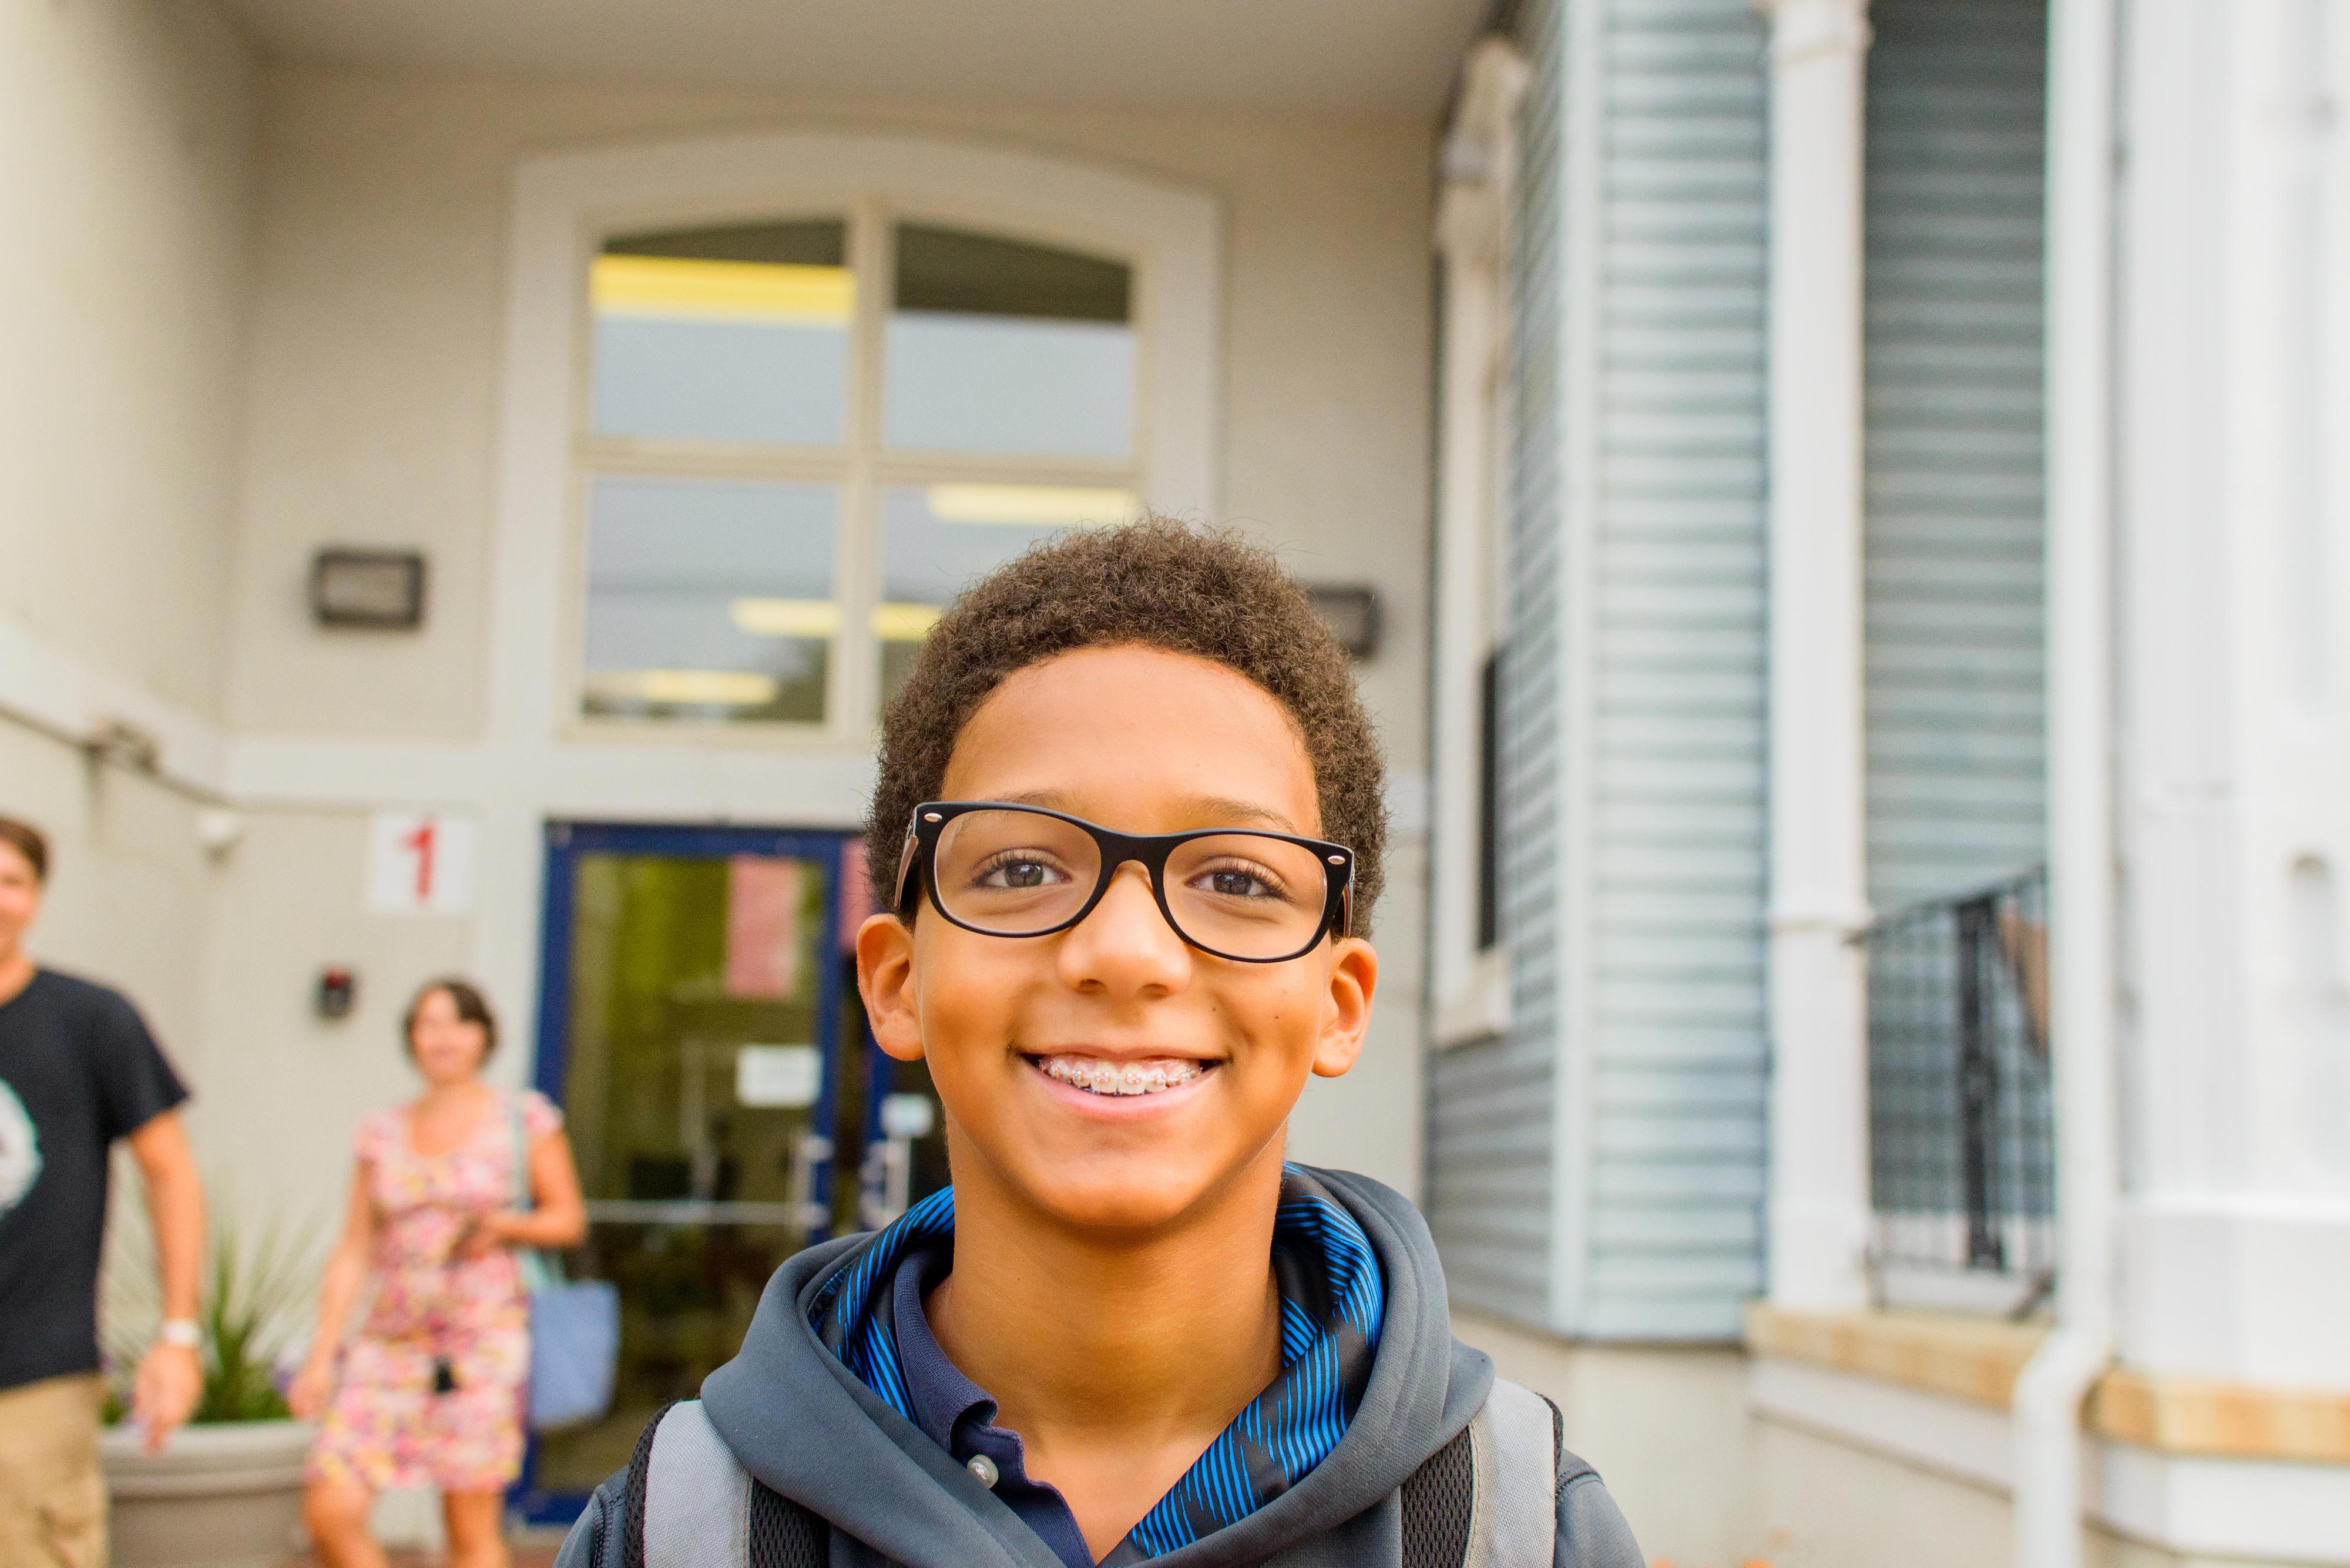 Hacks Middle School - Image 2